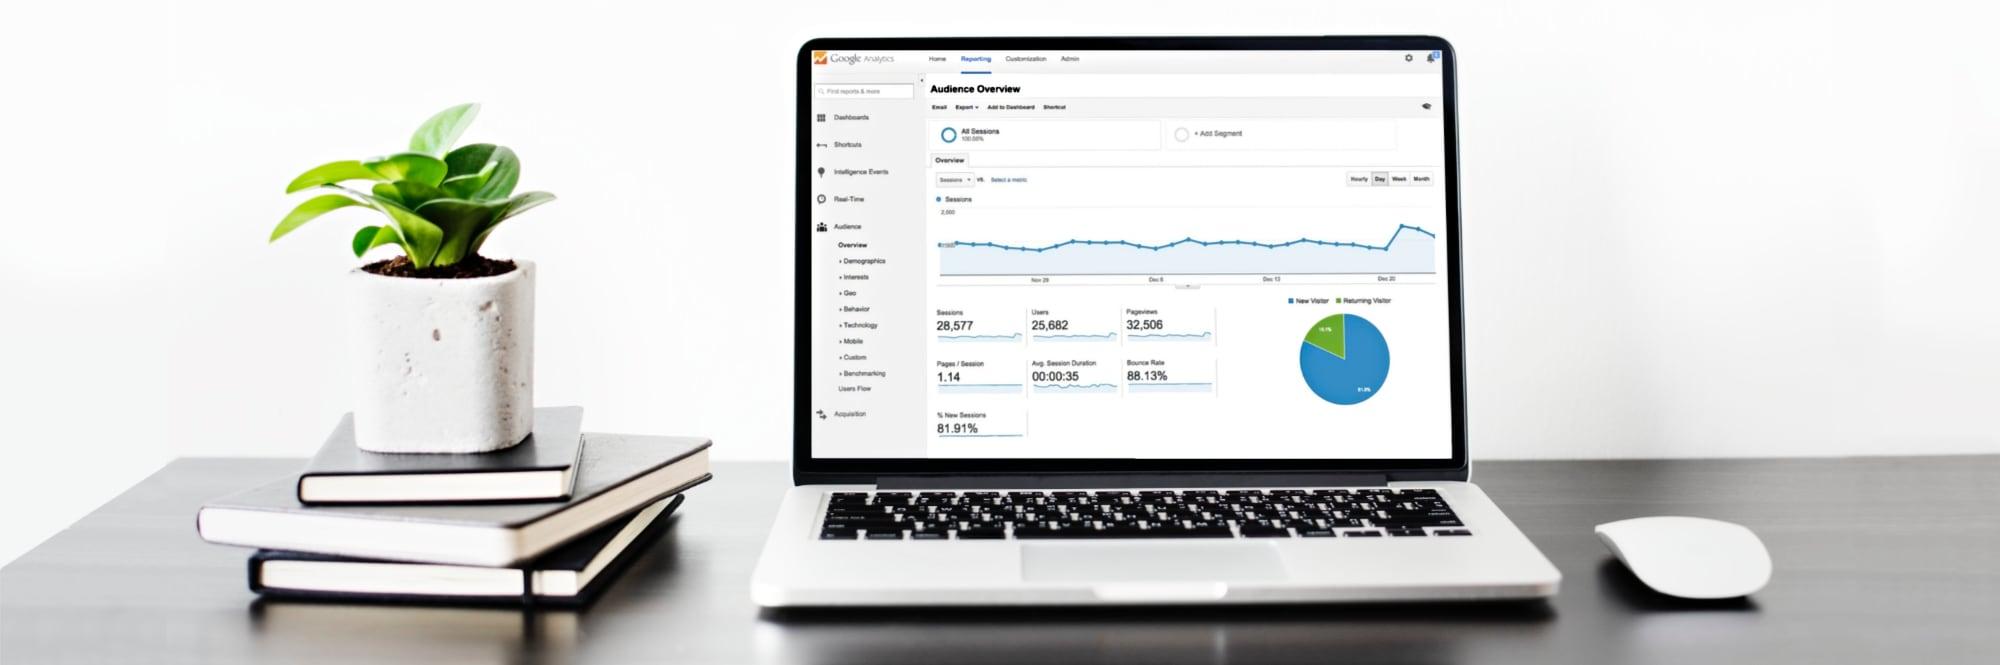 Agencia de Marketing digital en Mallorca | Lacebot. Google Analytics mostrada en pantalla de portátil (Agencia de Marketing online en Mallorca)